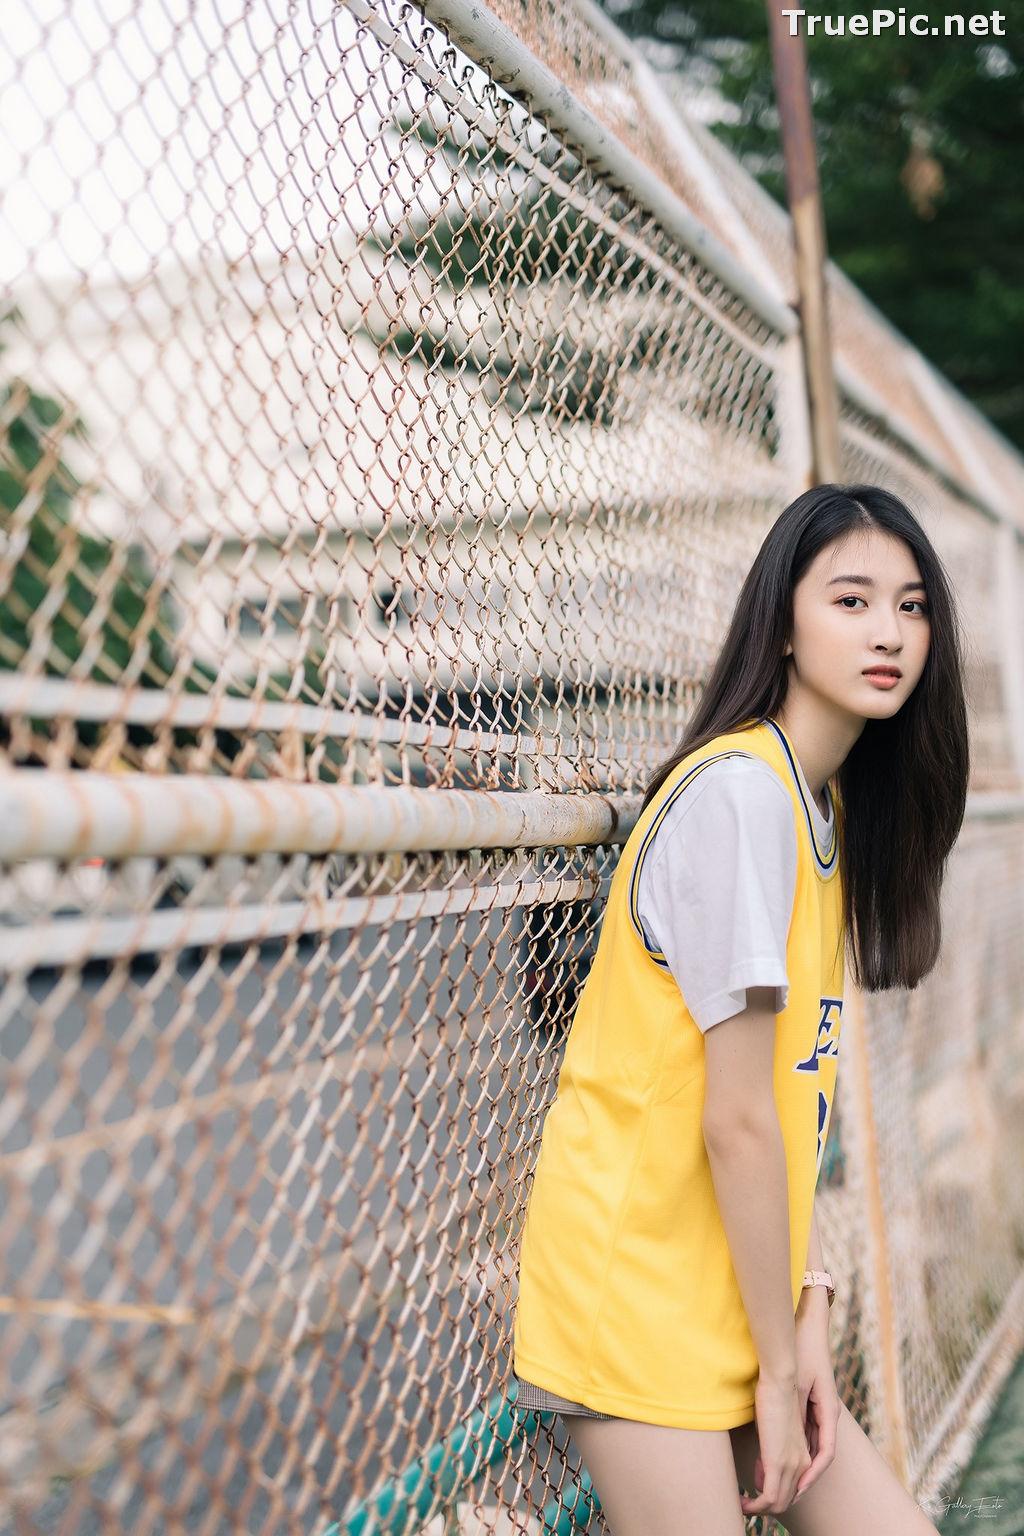 Image Thailand Beautiful Girl - View Benyapa - Long Hair Sport Girl - TruePic.net - Picture-6